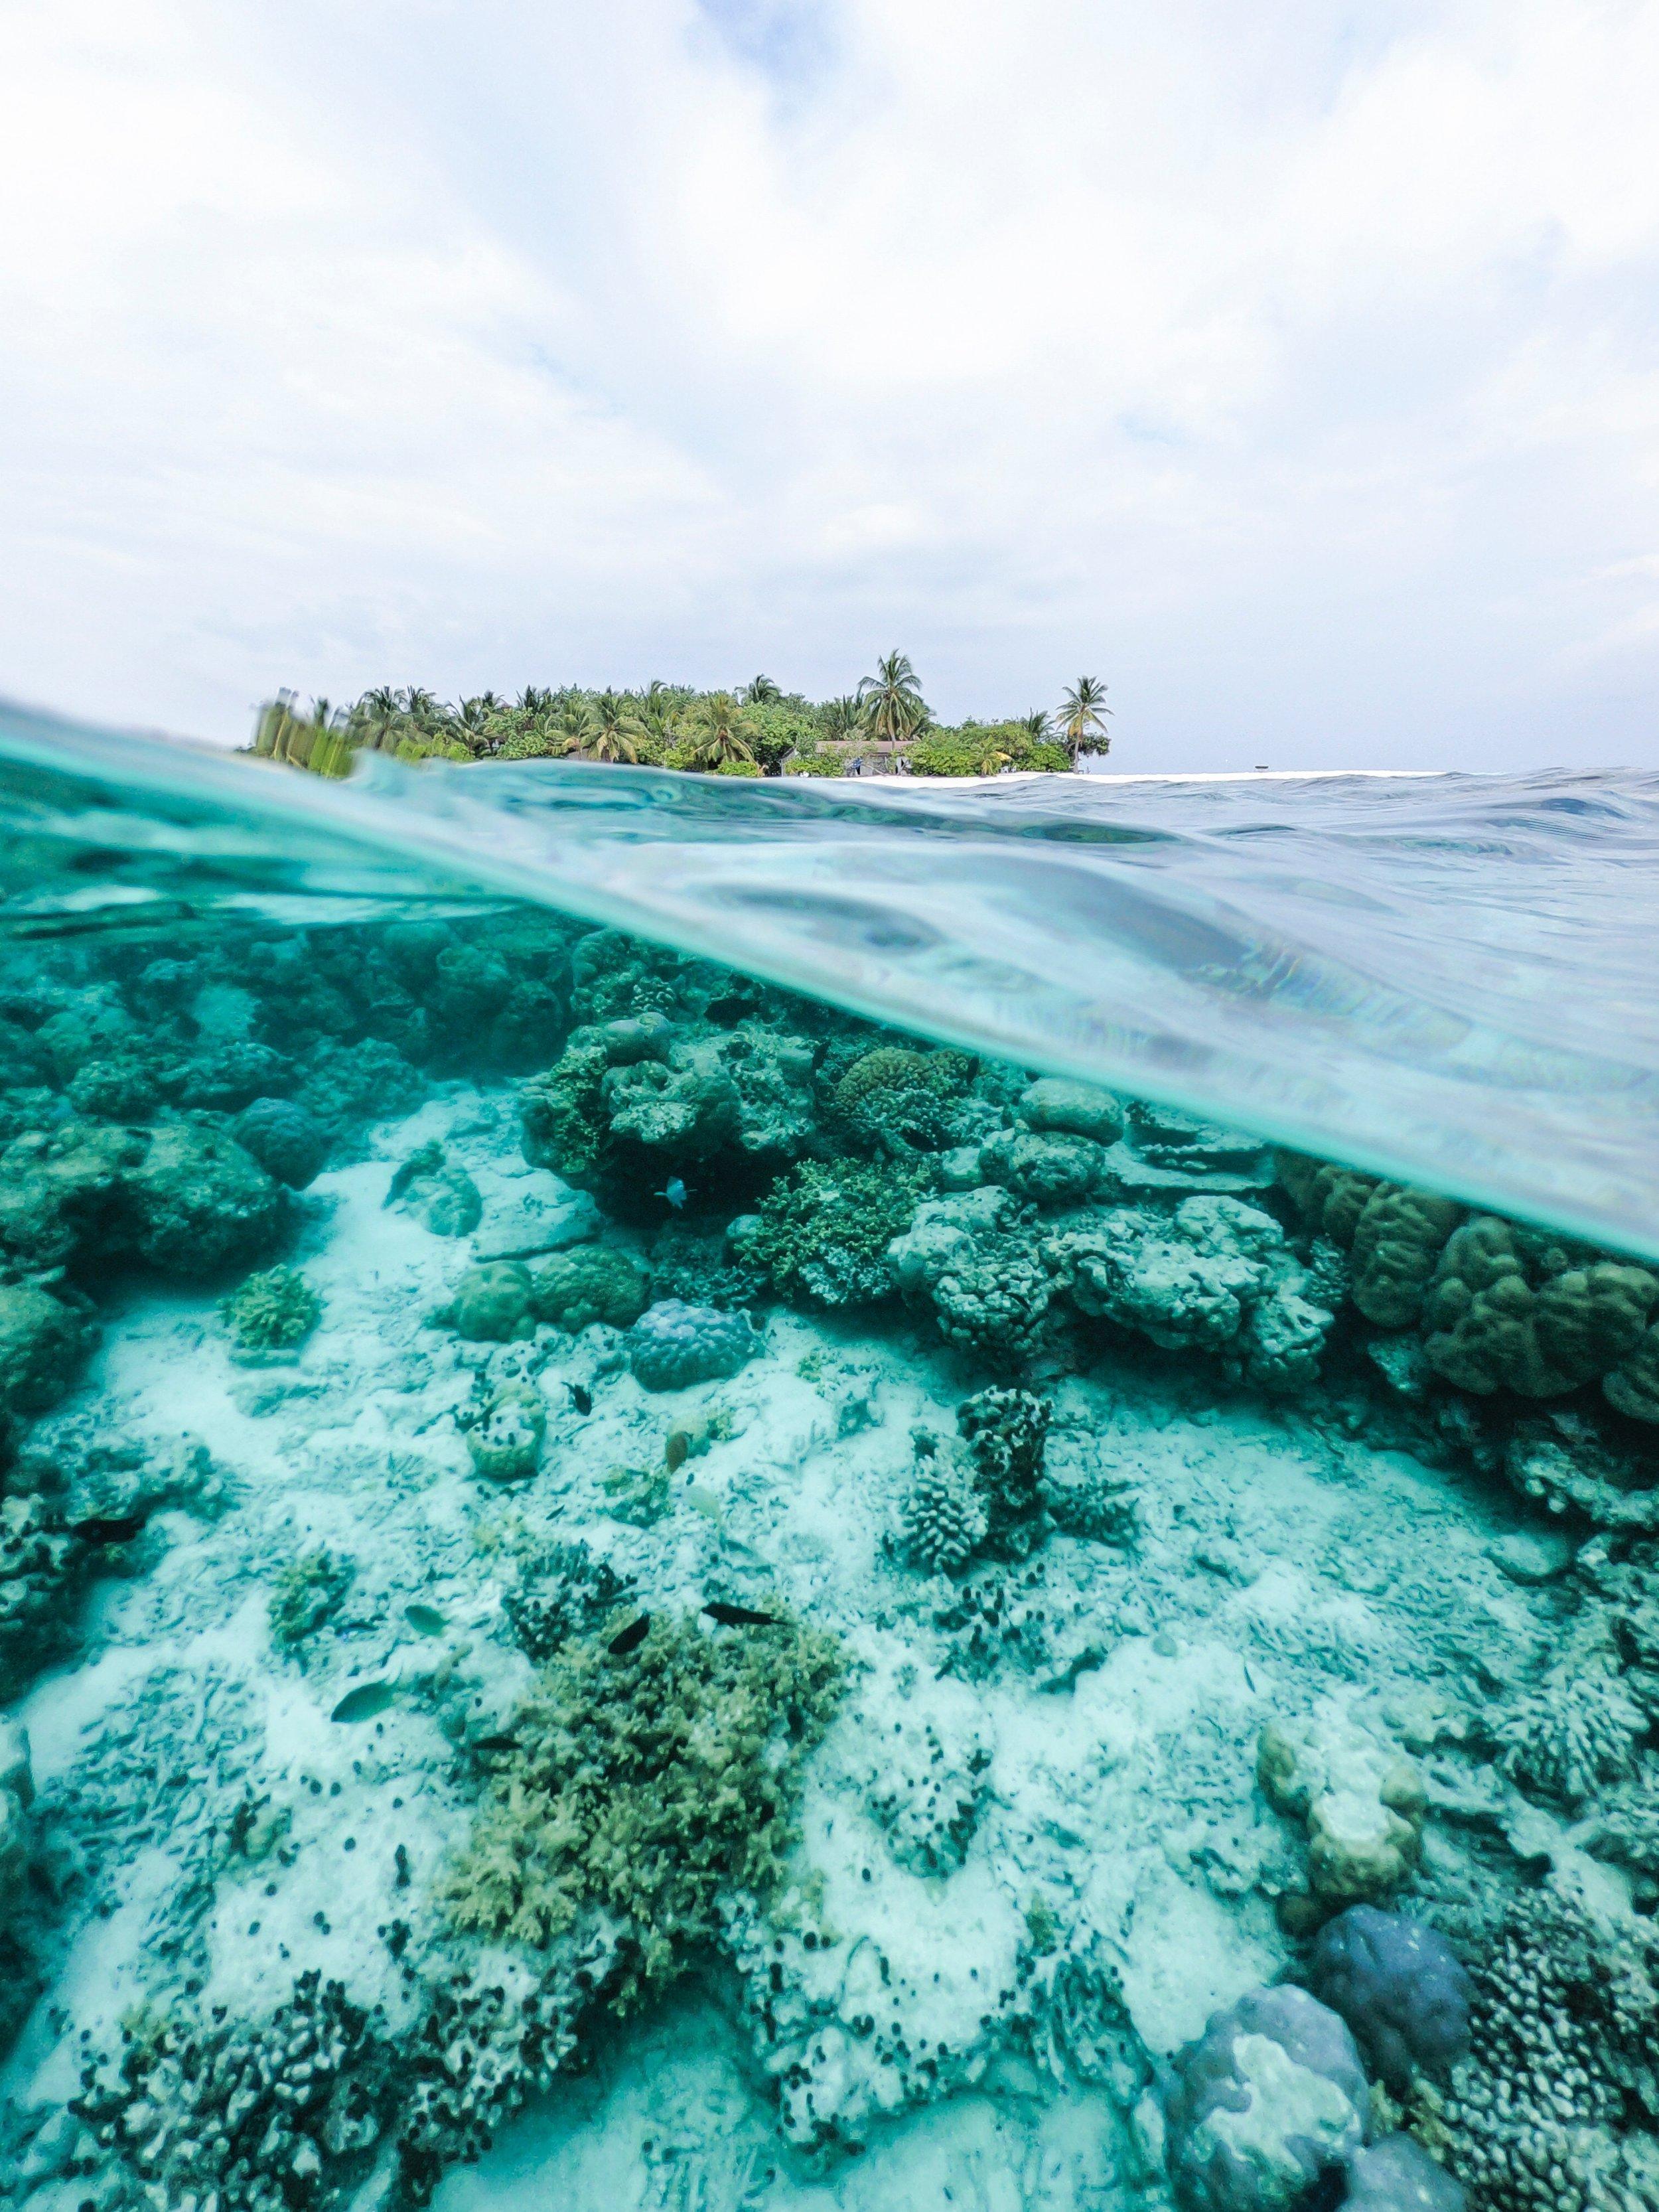 Sustainable_sunblock_coral_reef_ishan_seefromthesky_unsplash.jpg